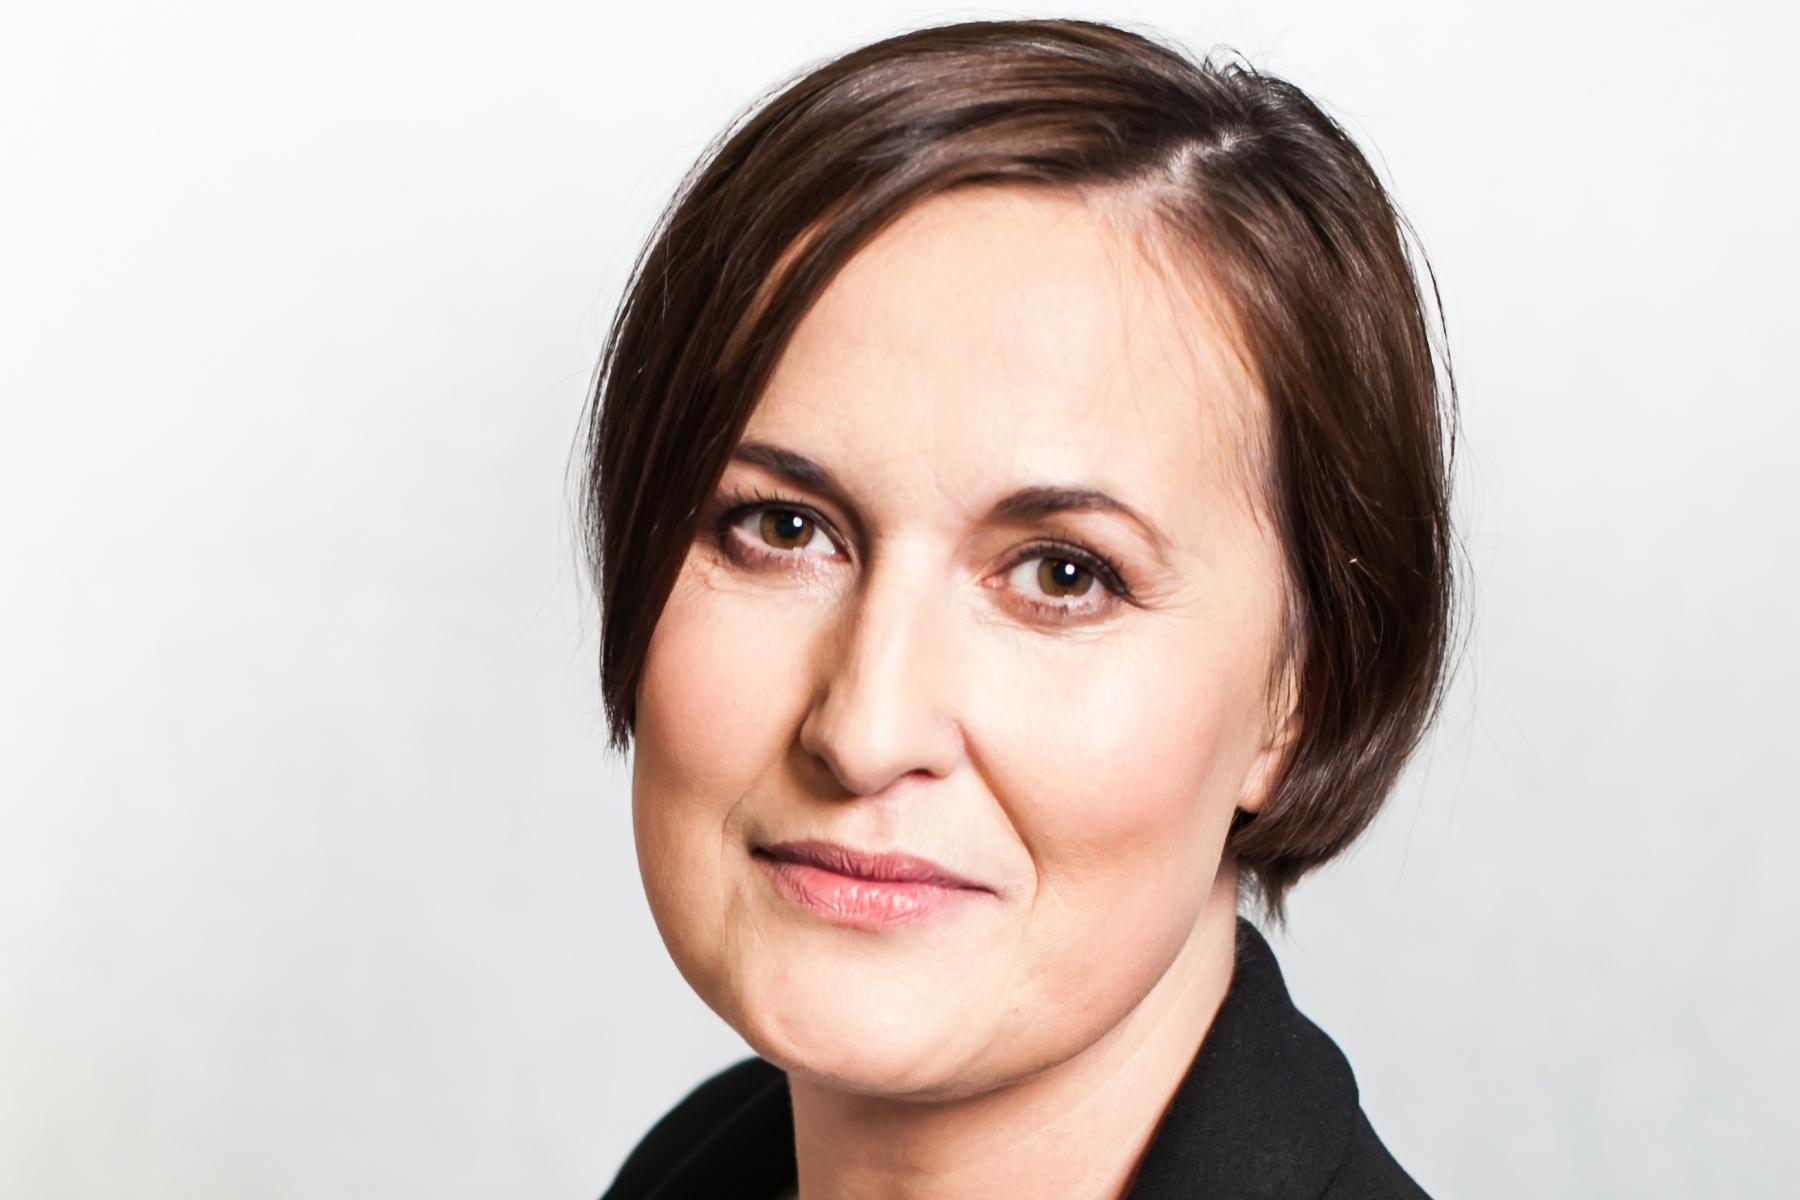 Eurozet - nowy dyrektor marketingu Radio Zet eurozet